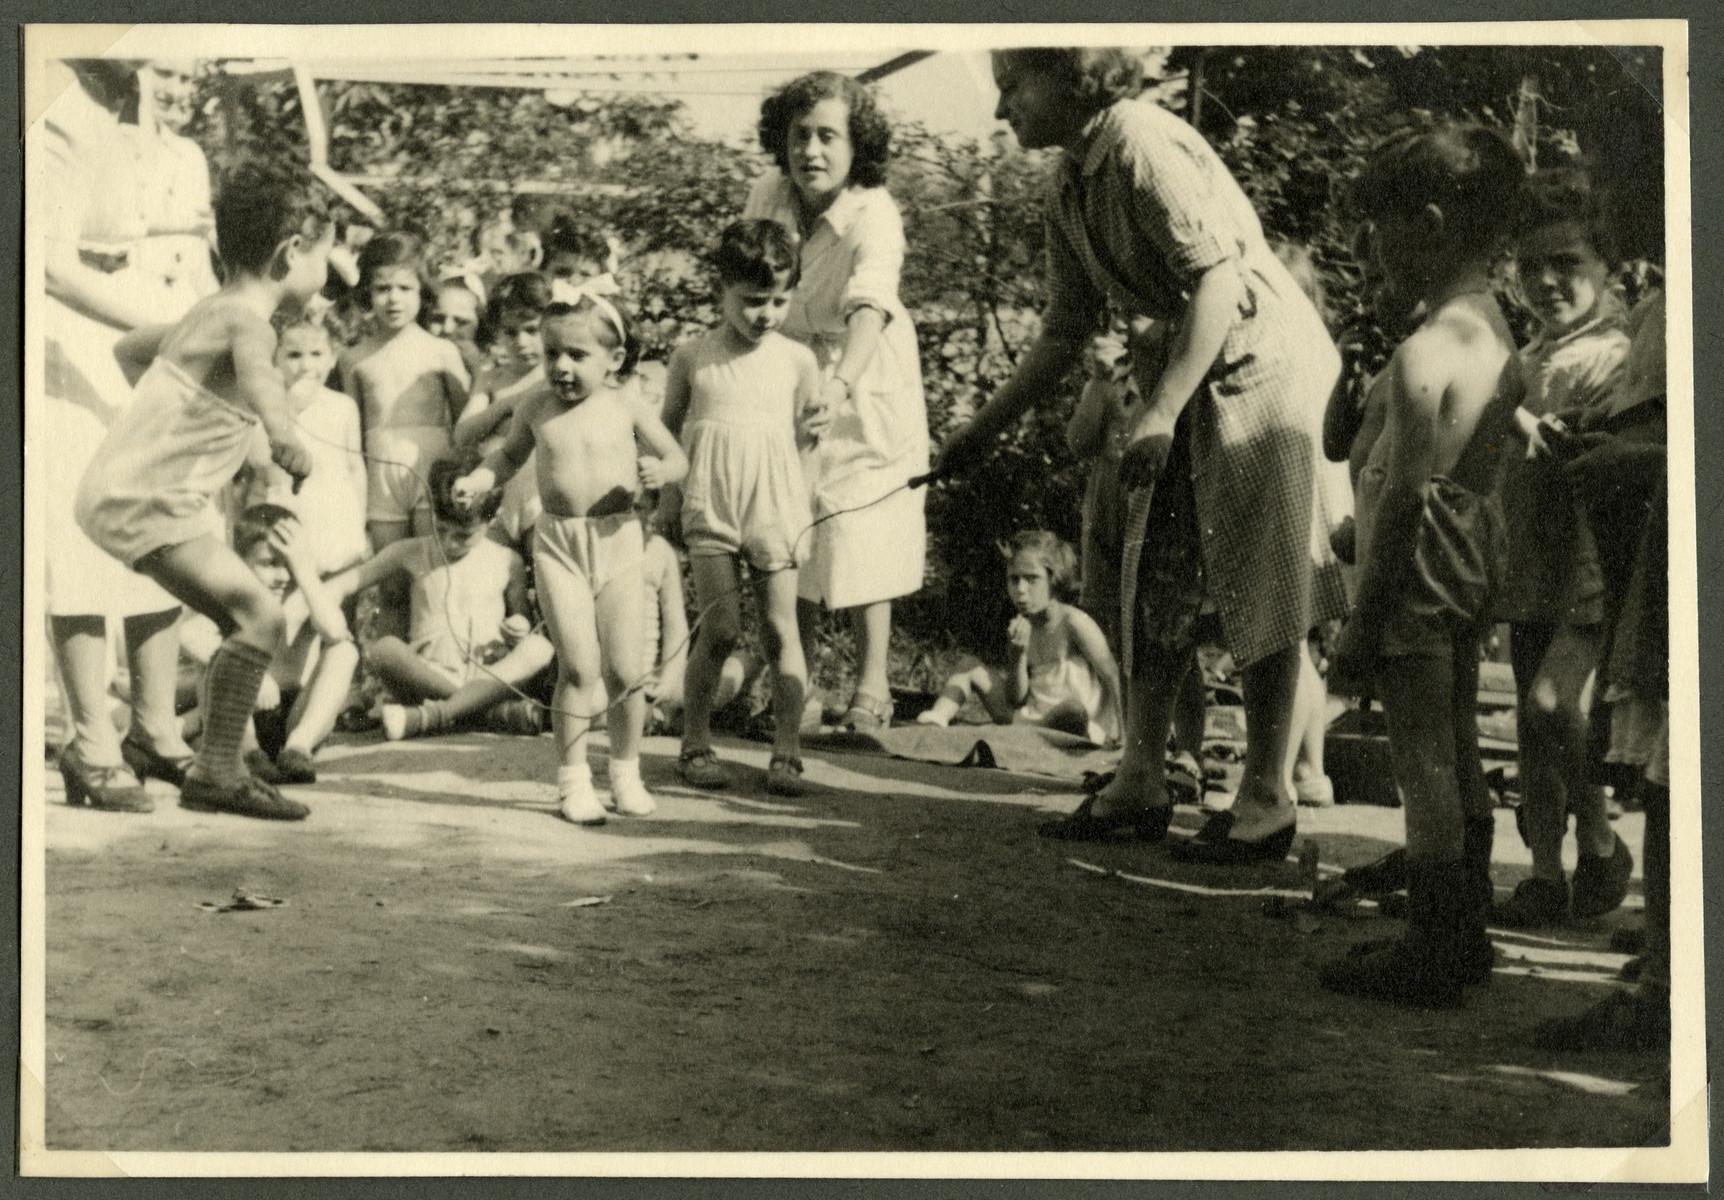 Children from the Nos Petits children's home in Belgium jump rope in a garden.